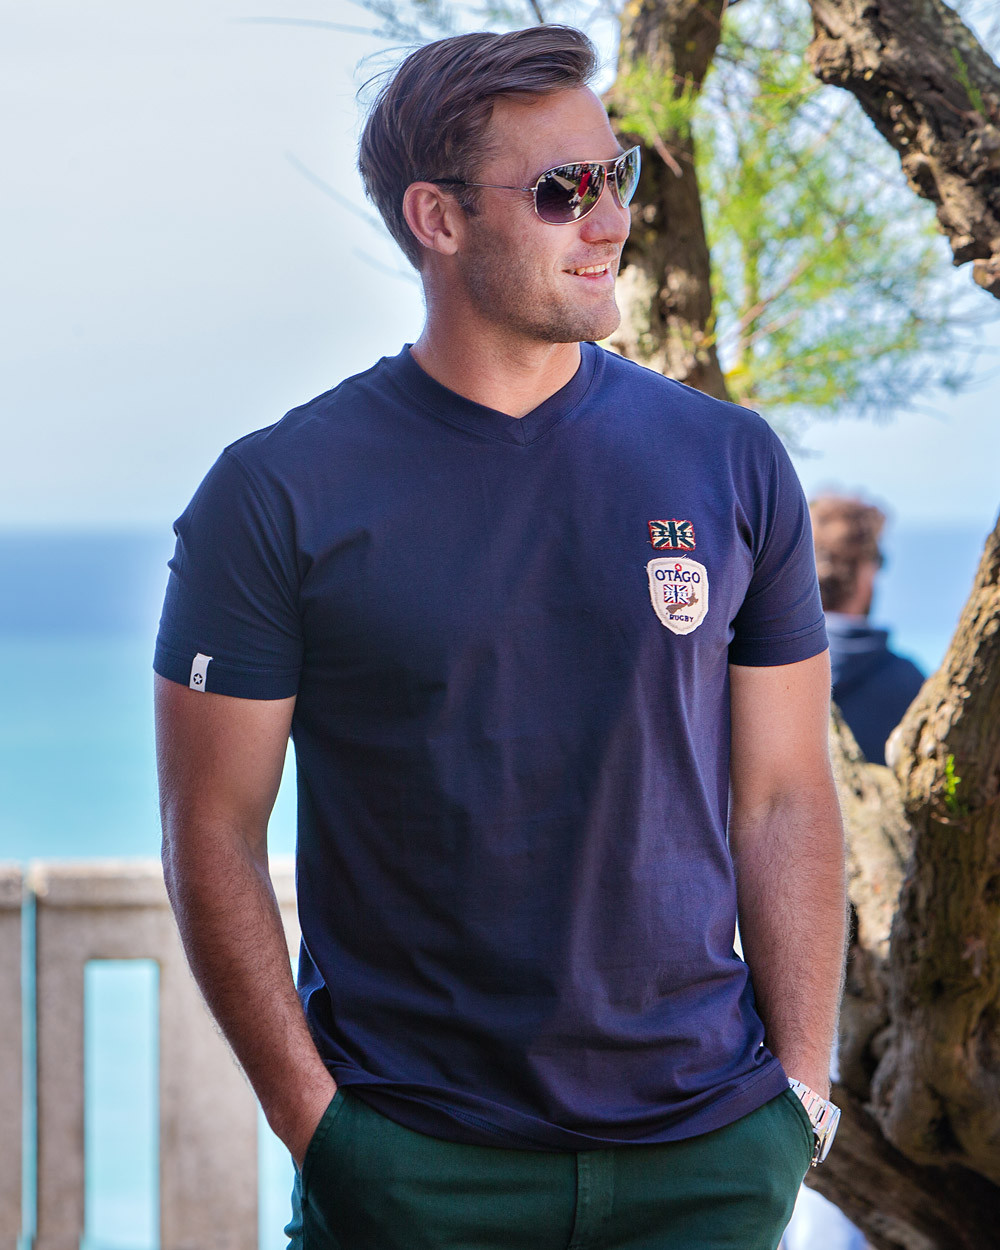 T-shirt burnsy Expiji otago rugby homme